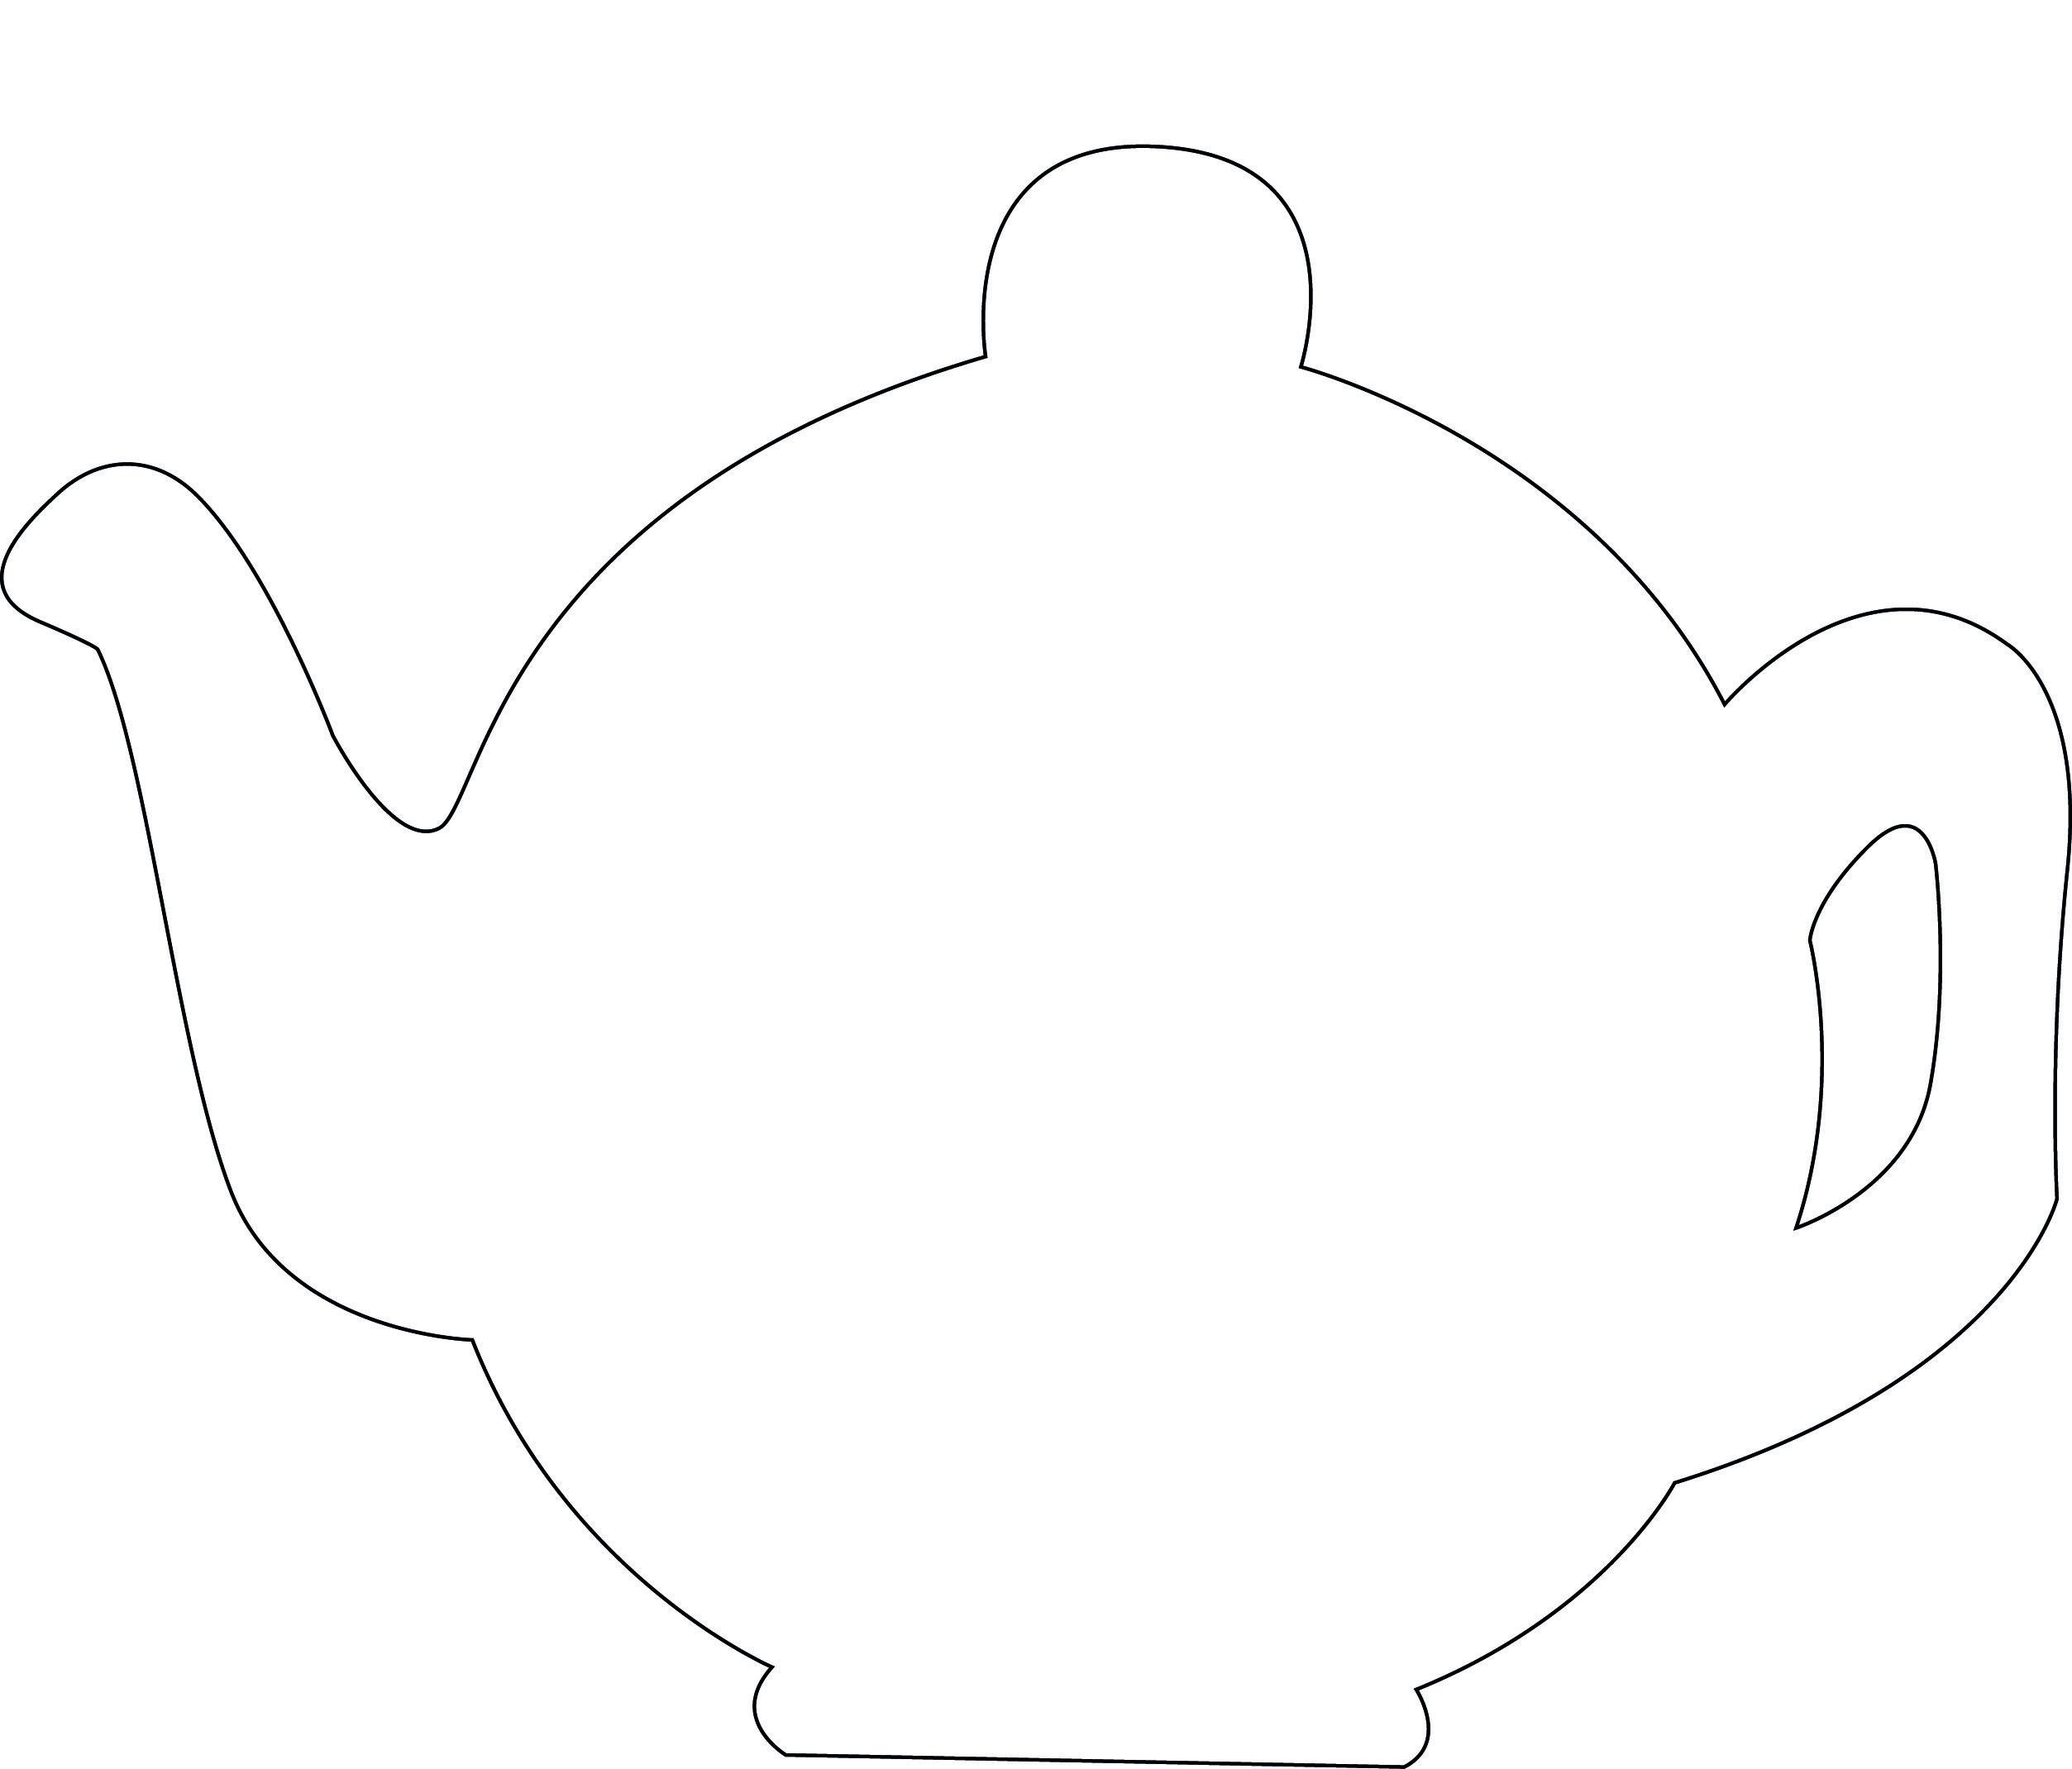 Pin by Diane Murray on Craft Ideas | Pinterest | Teapot, Tutorials ...